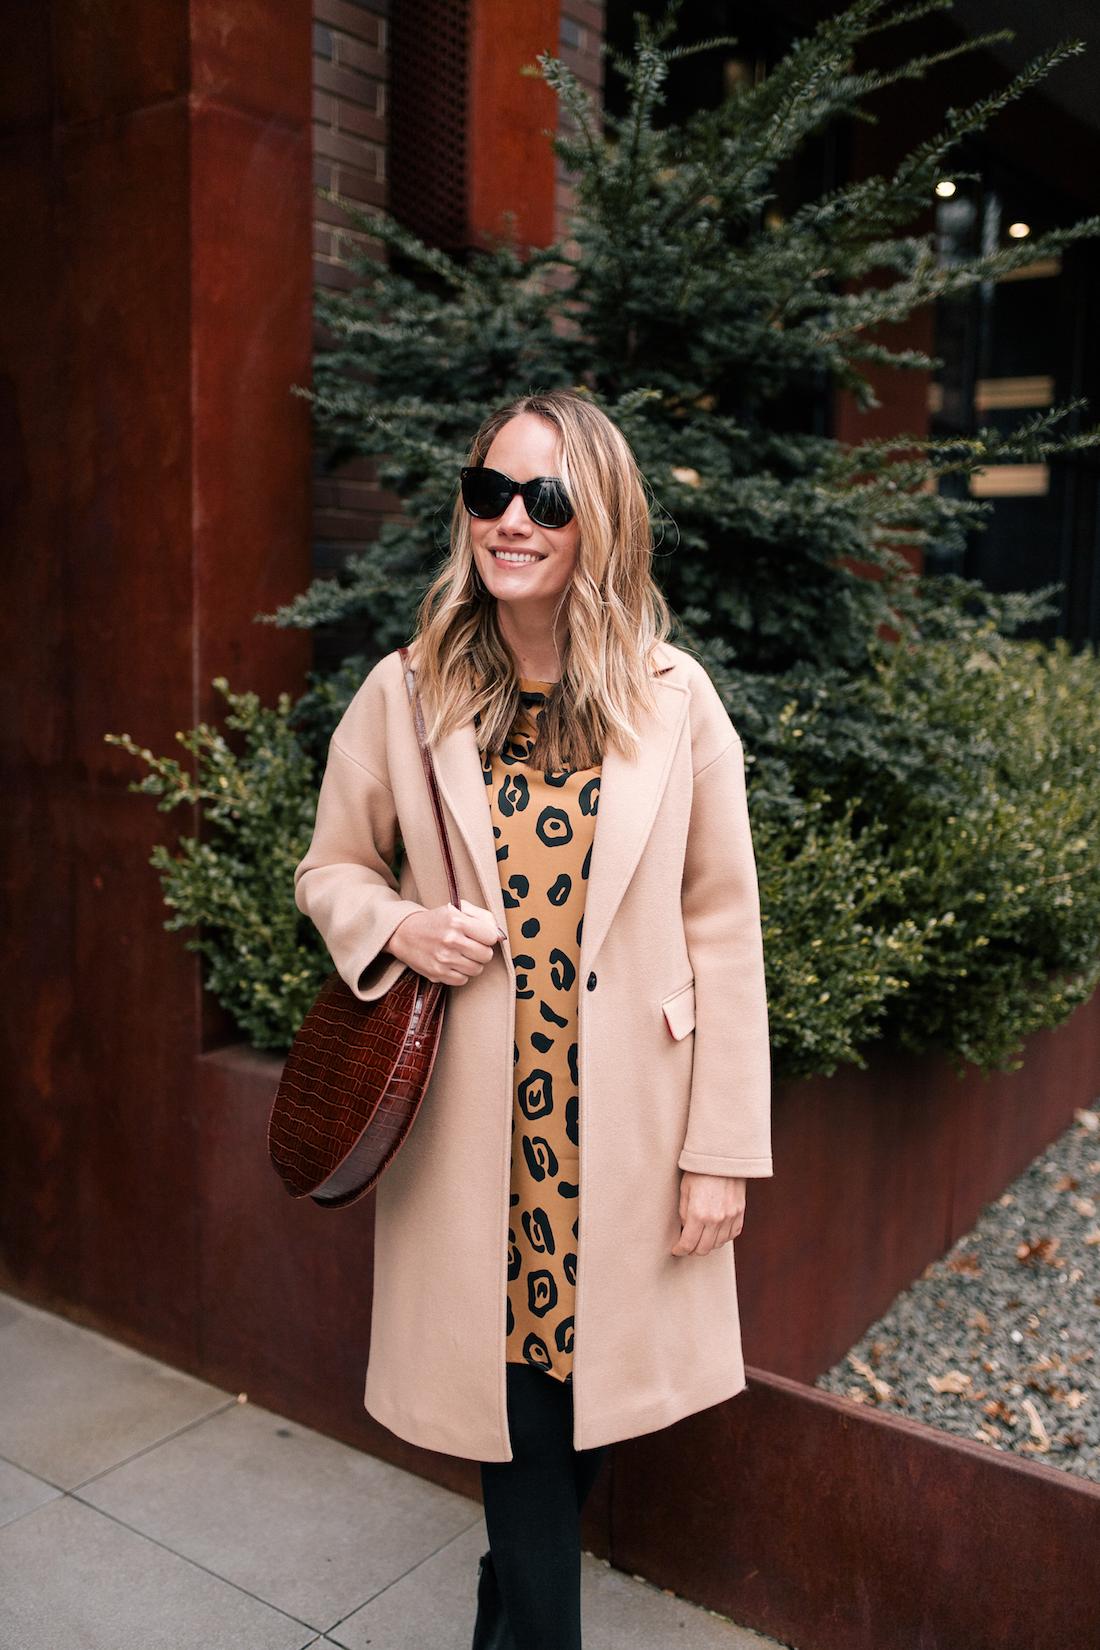 Outfit Details: Topshop Camel Coat // Target Leopard Dress // Express Opaque Tights / Sézane Bag // Polaroid Sunglasses